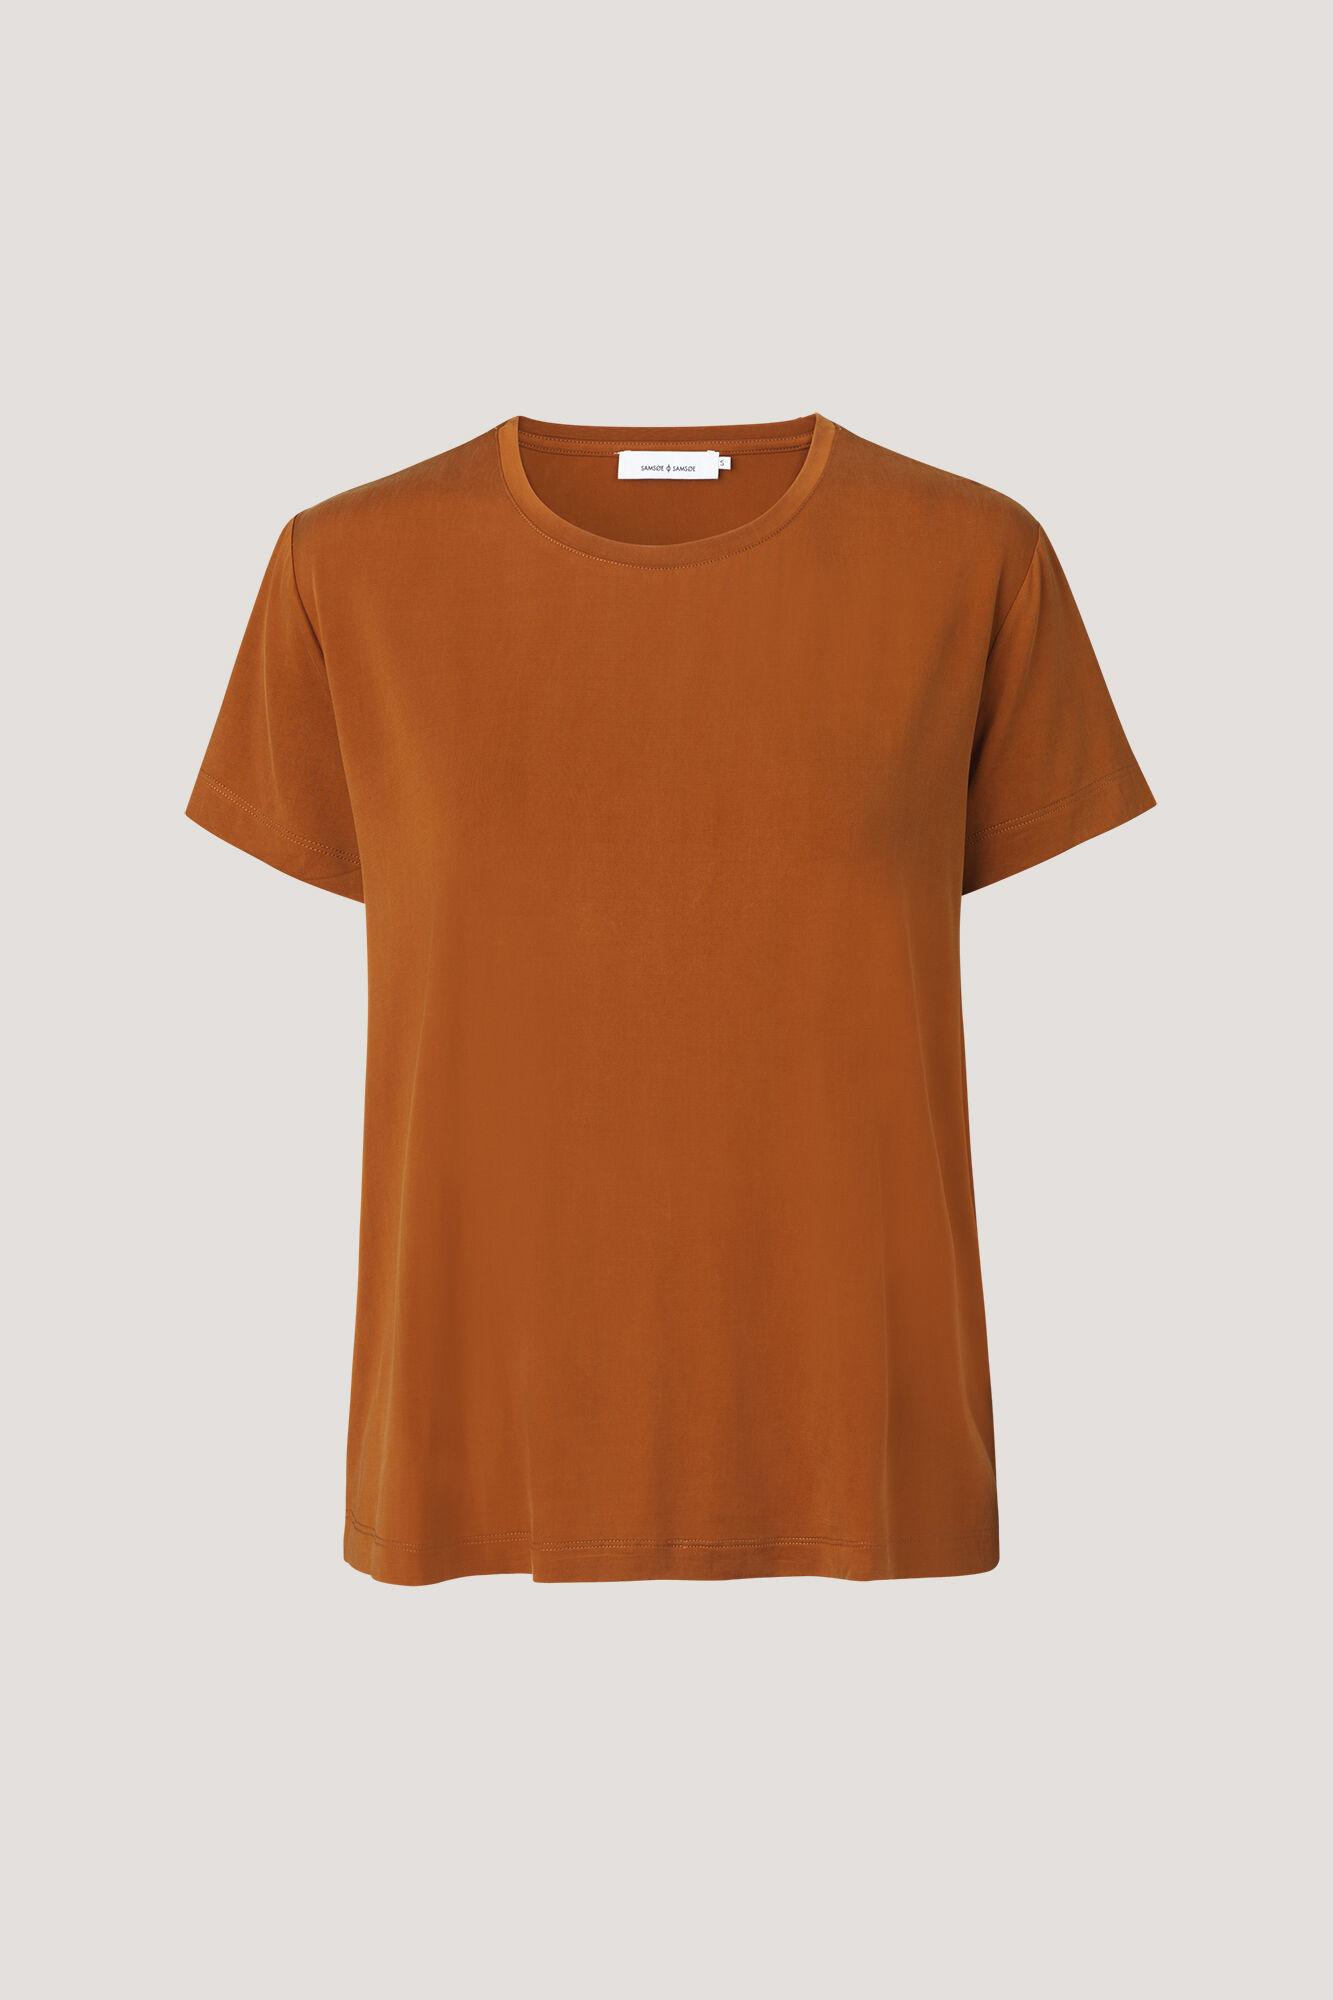 SAMSOE t-shirt siff-4